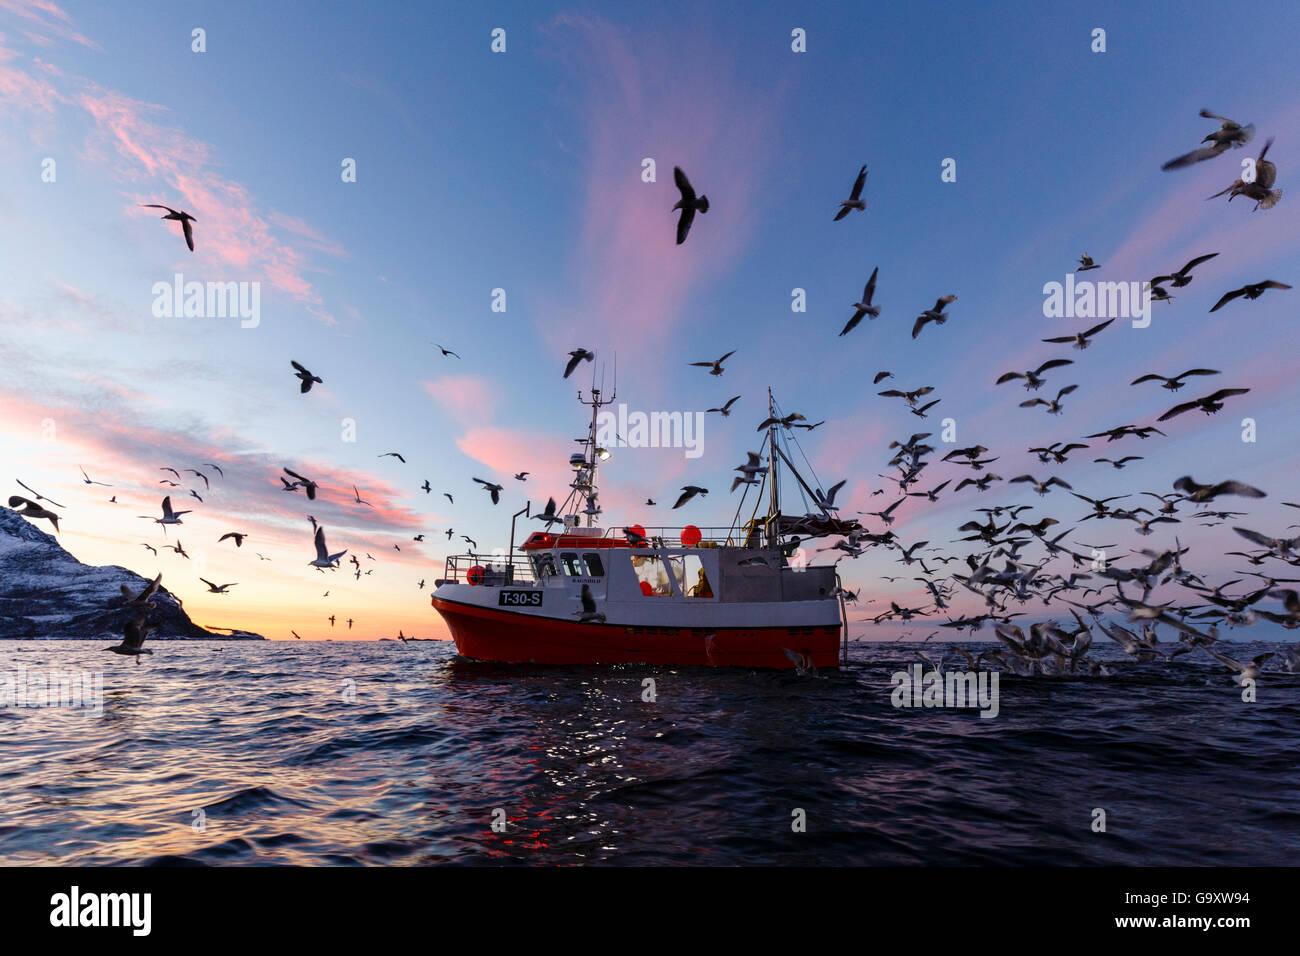 Möwen (Laridae) nach kleinen Fischerboot, Kvaloya, Troms, Norwegen, November. Stockbild